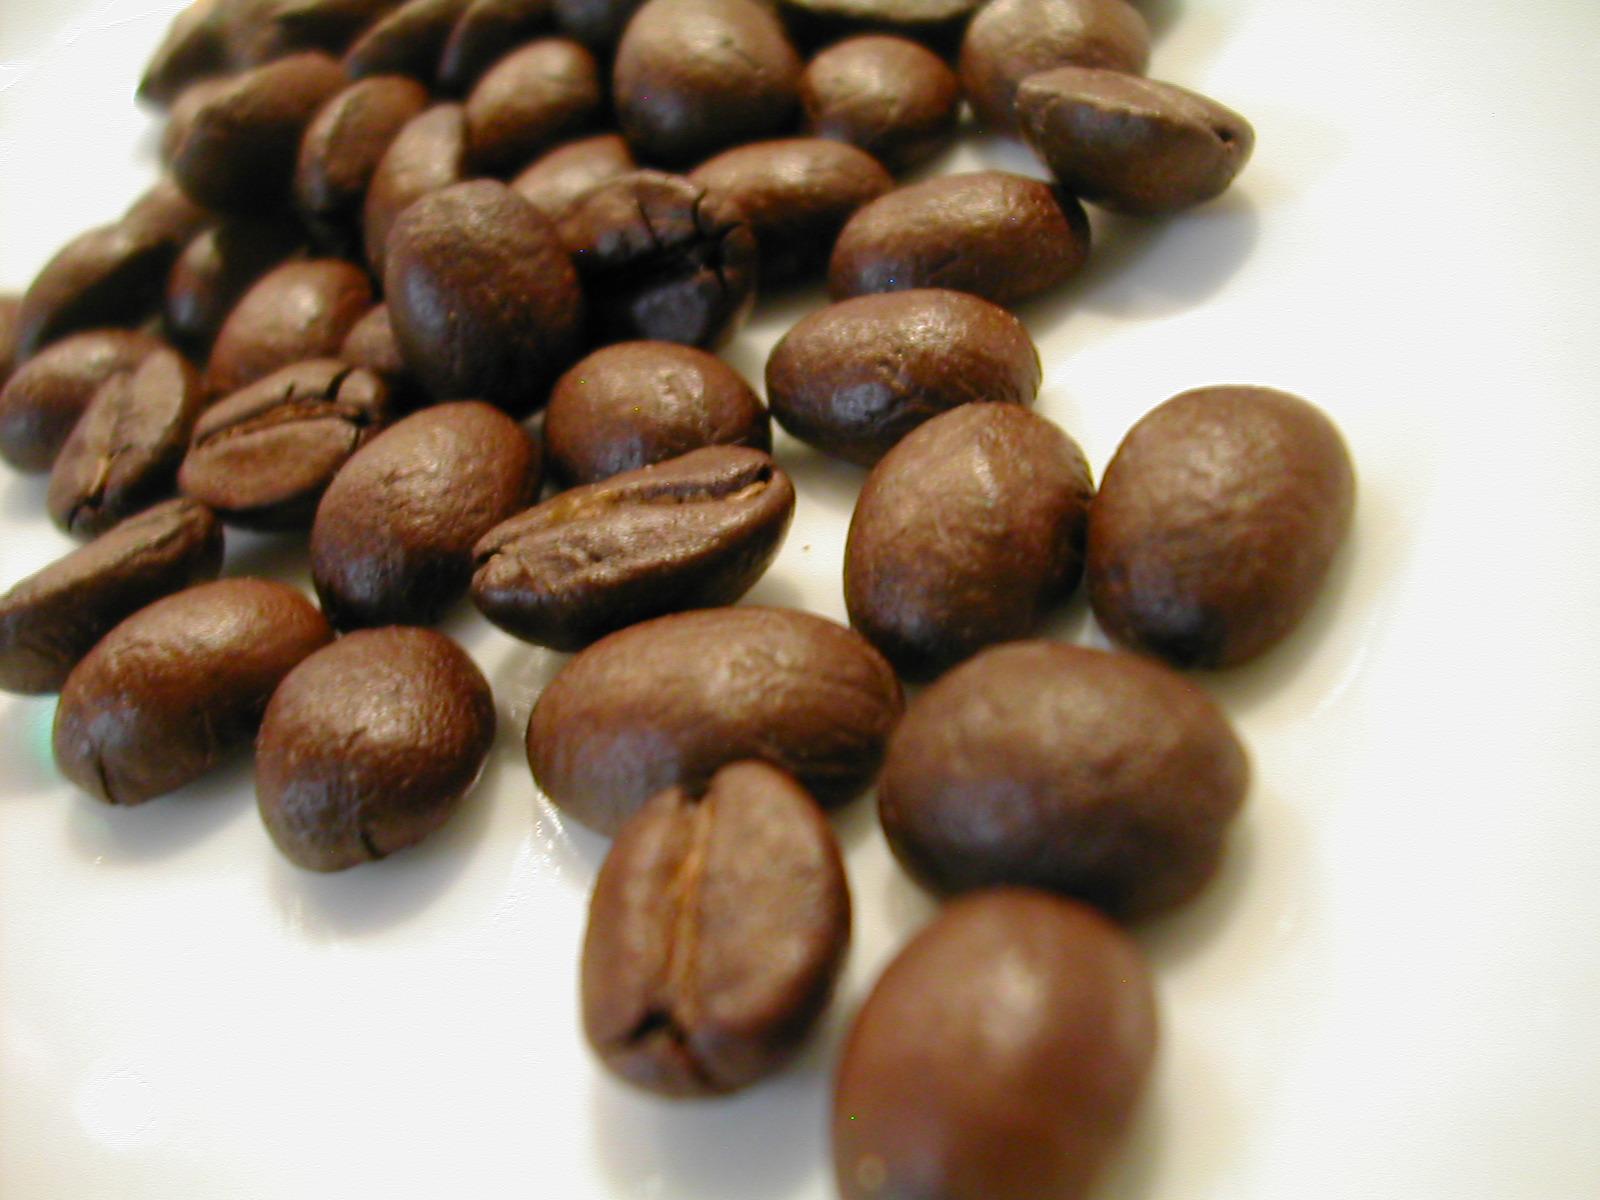 Set ■ Big 1.5 kg ■ coffee beans each 500 g × 3 species repeat OK! -Granfasarsbrend 500 g Guatemala retana plantation 500 g, fresh coffee beans 500 g